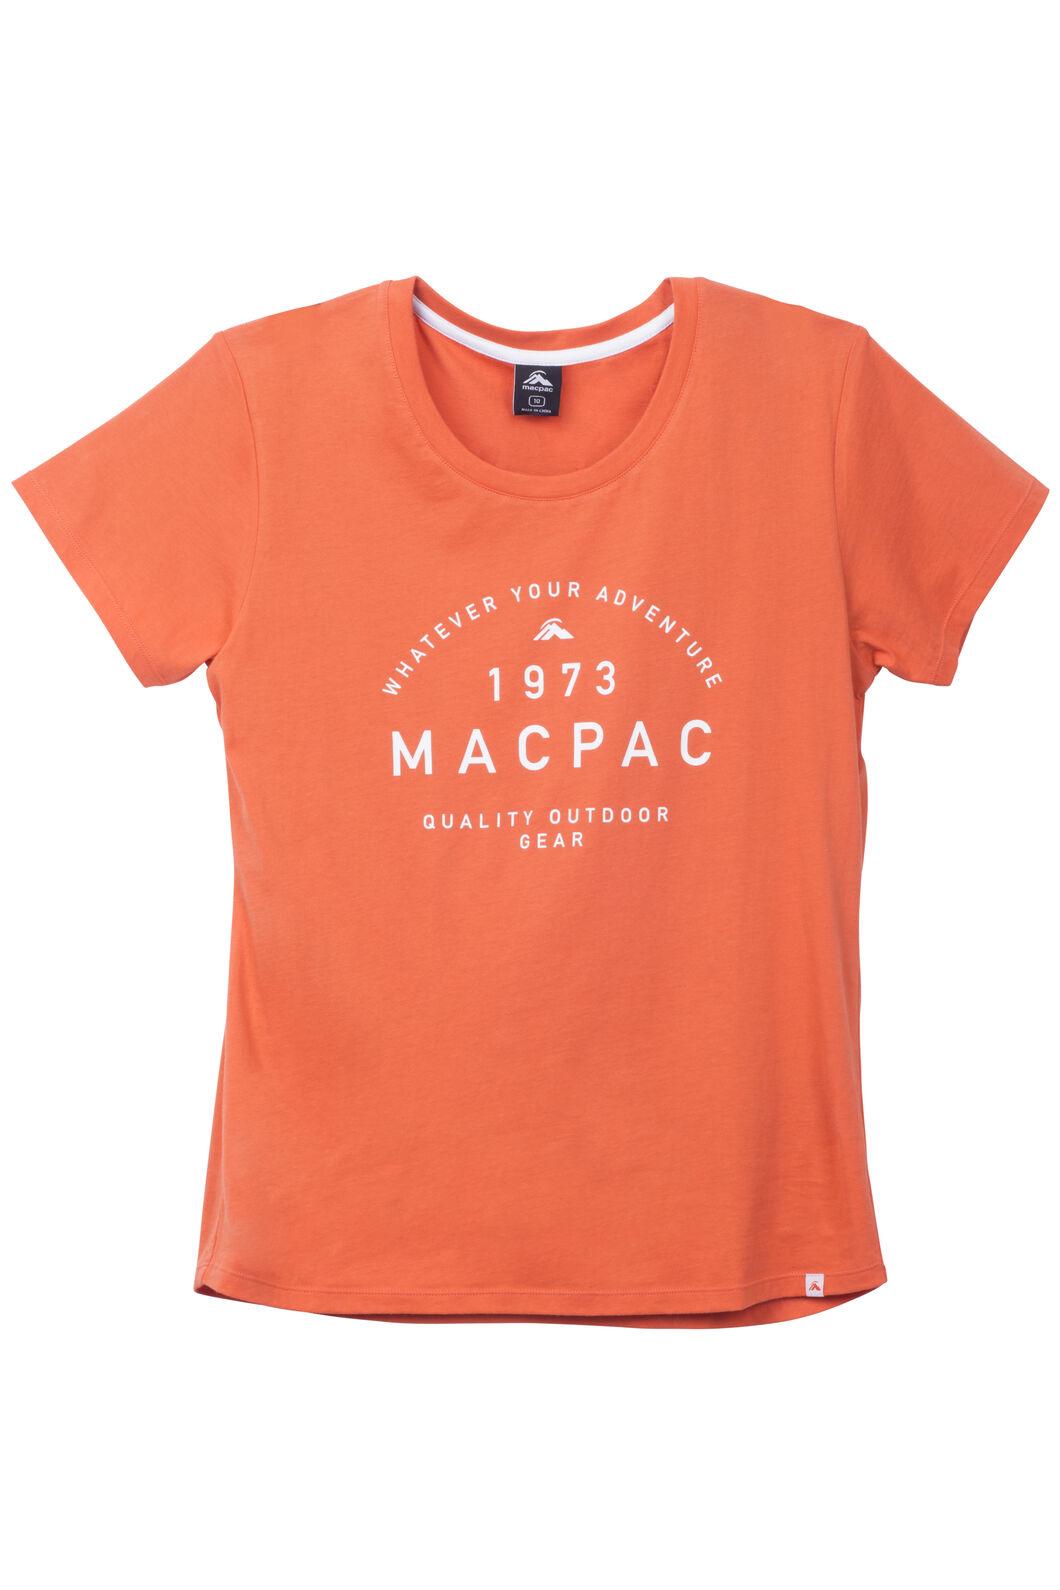 Macpac Adventure Organic Cotton Tee - Women's, Koi, hi-res